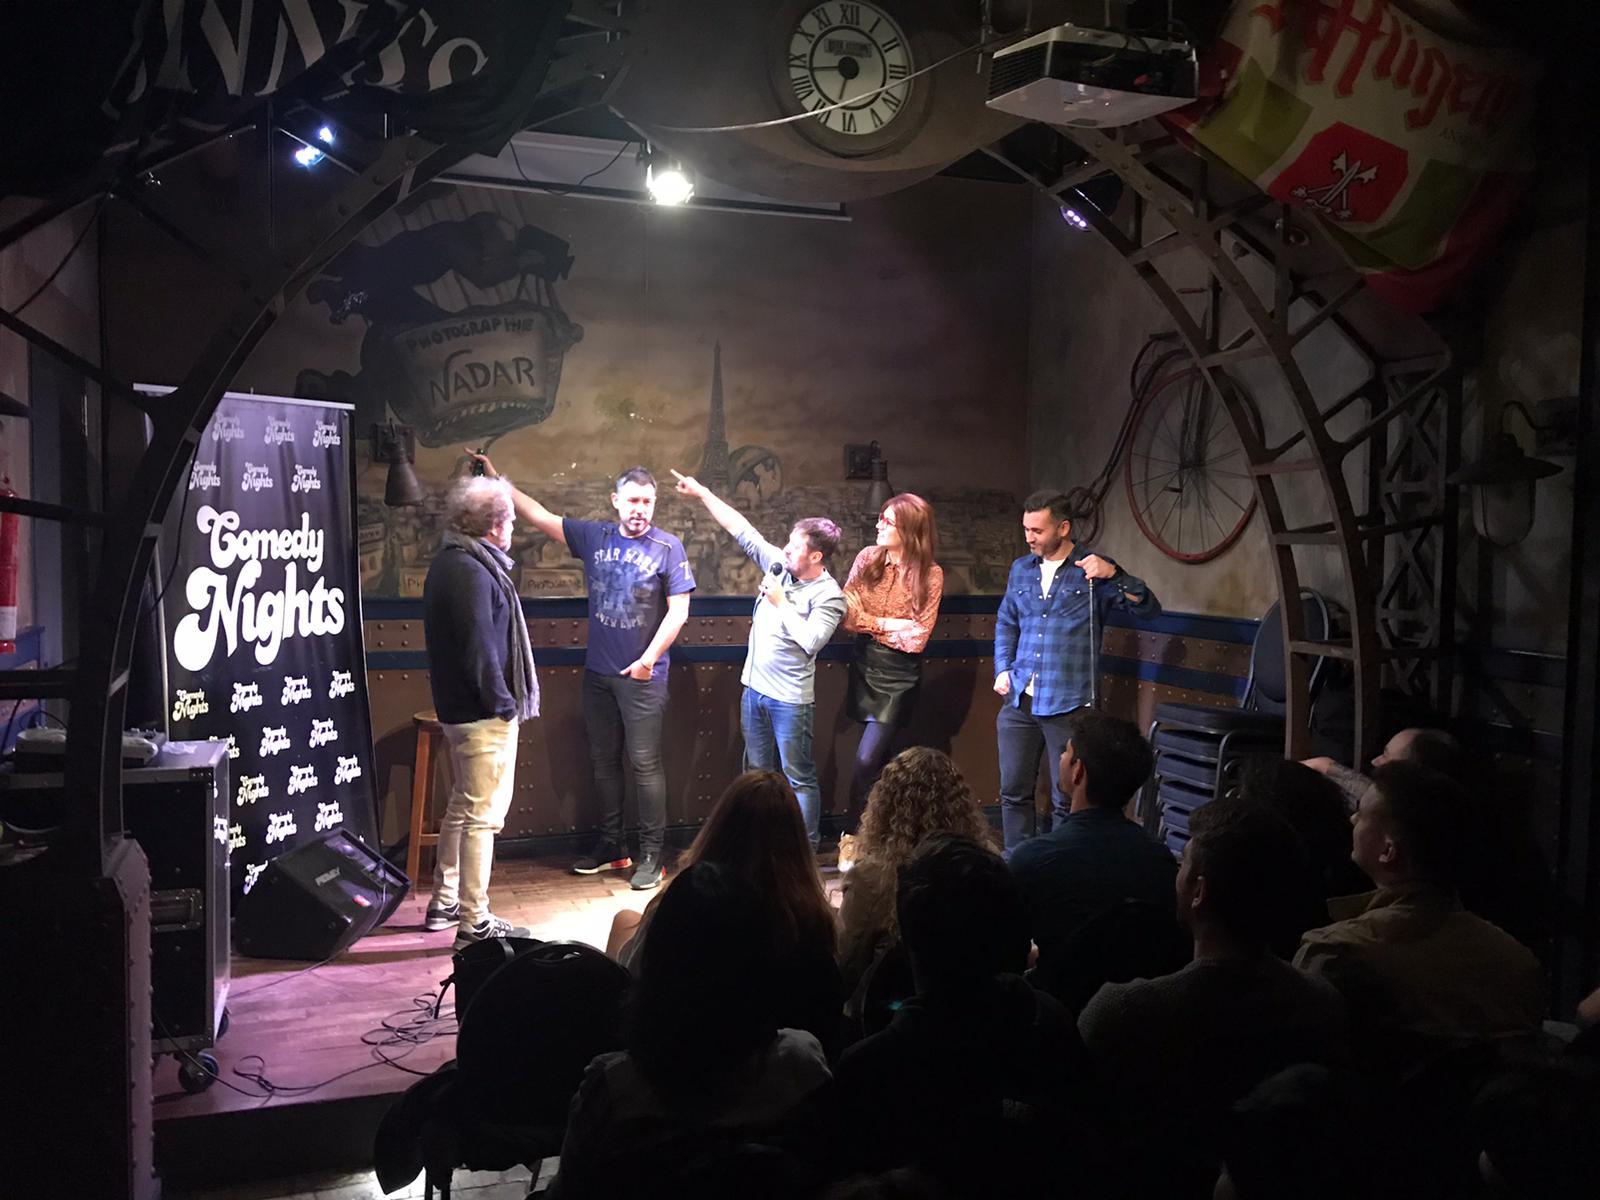 Juan Solo - Comikazes - Iñaki Urrutia y Don Mauro con Elsa Ruiz, Karim y Richard Salamanca en Beer Station - Monólogos en Madrid